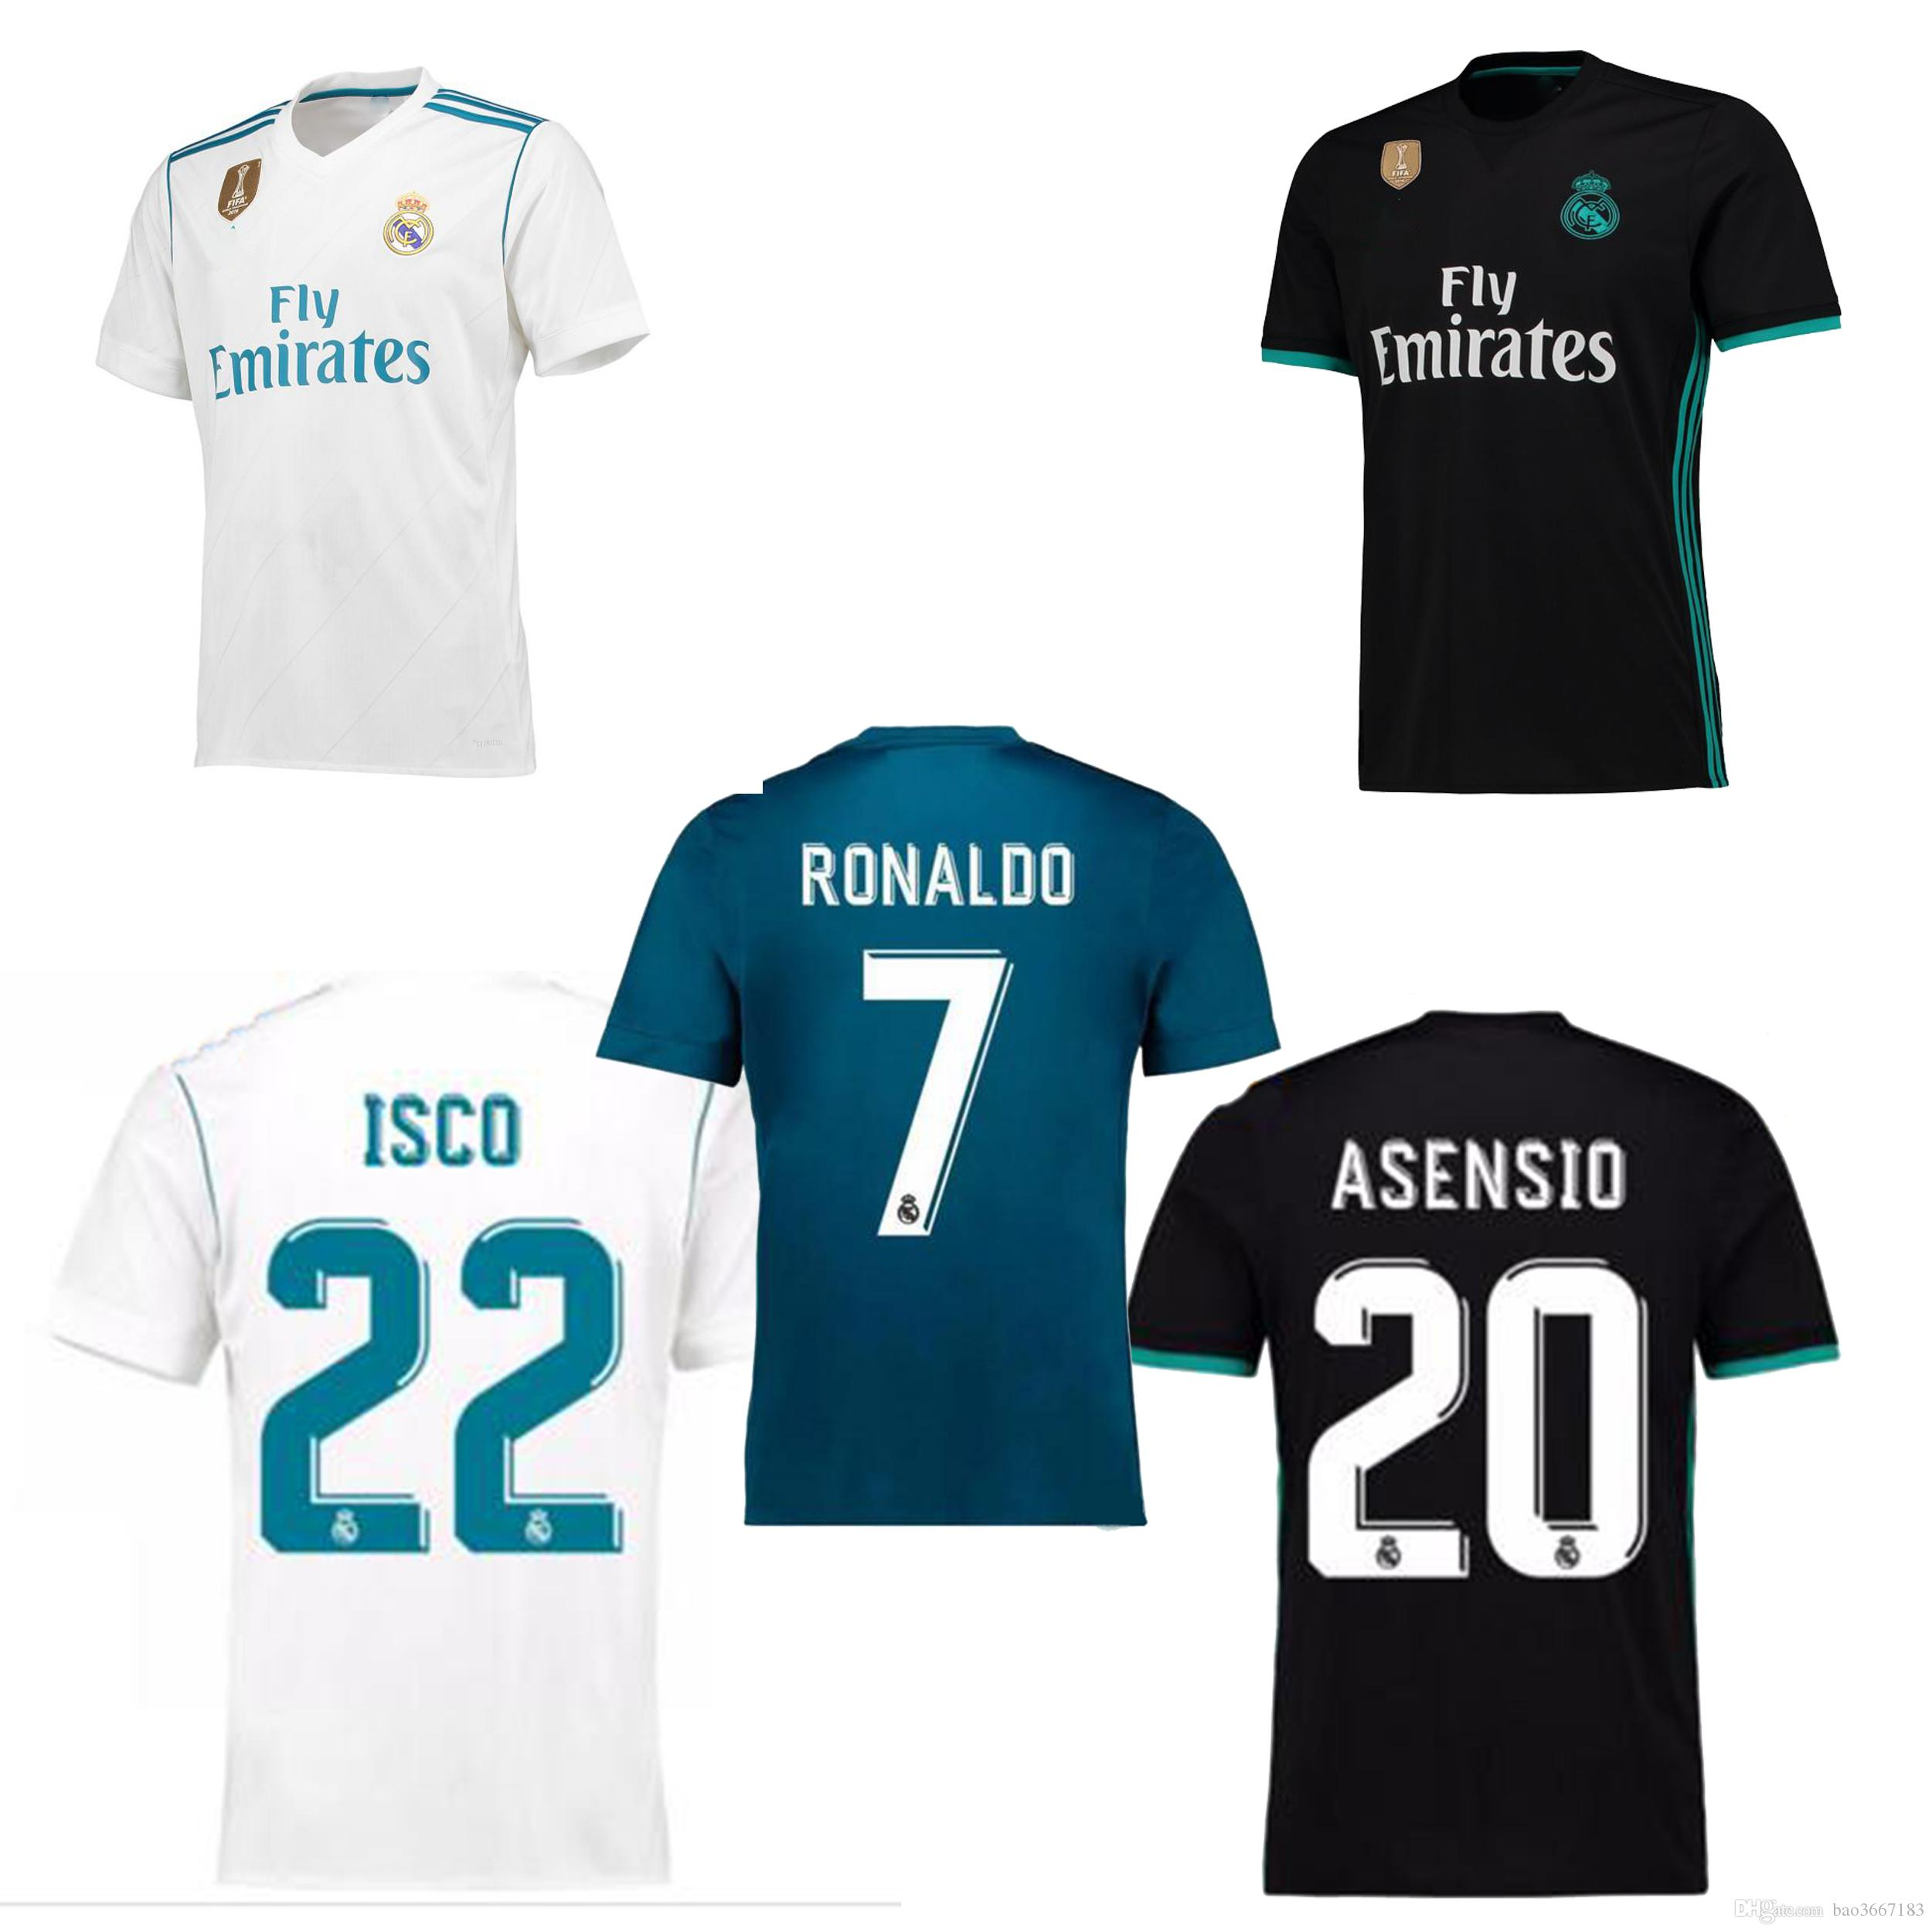 2018 real madrid soccer jersey 2017 18 real madrid home away 3rd soccer jerseys 17 18 ronaldo asensioisco kroos modric football jeresys real madrid so